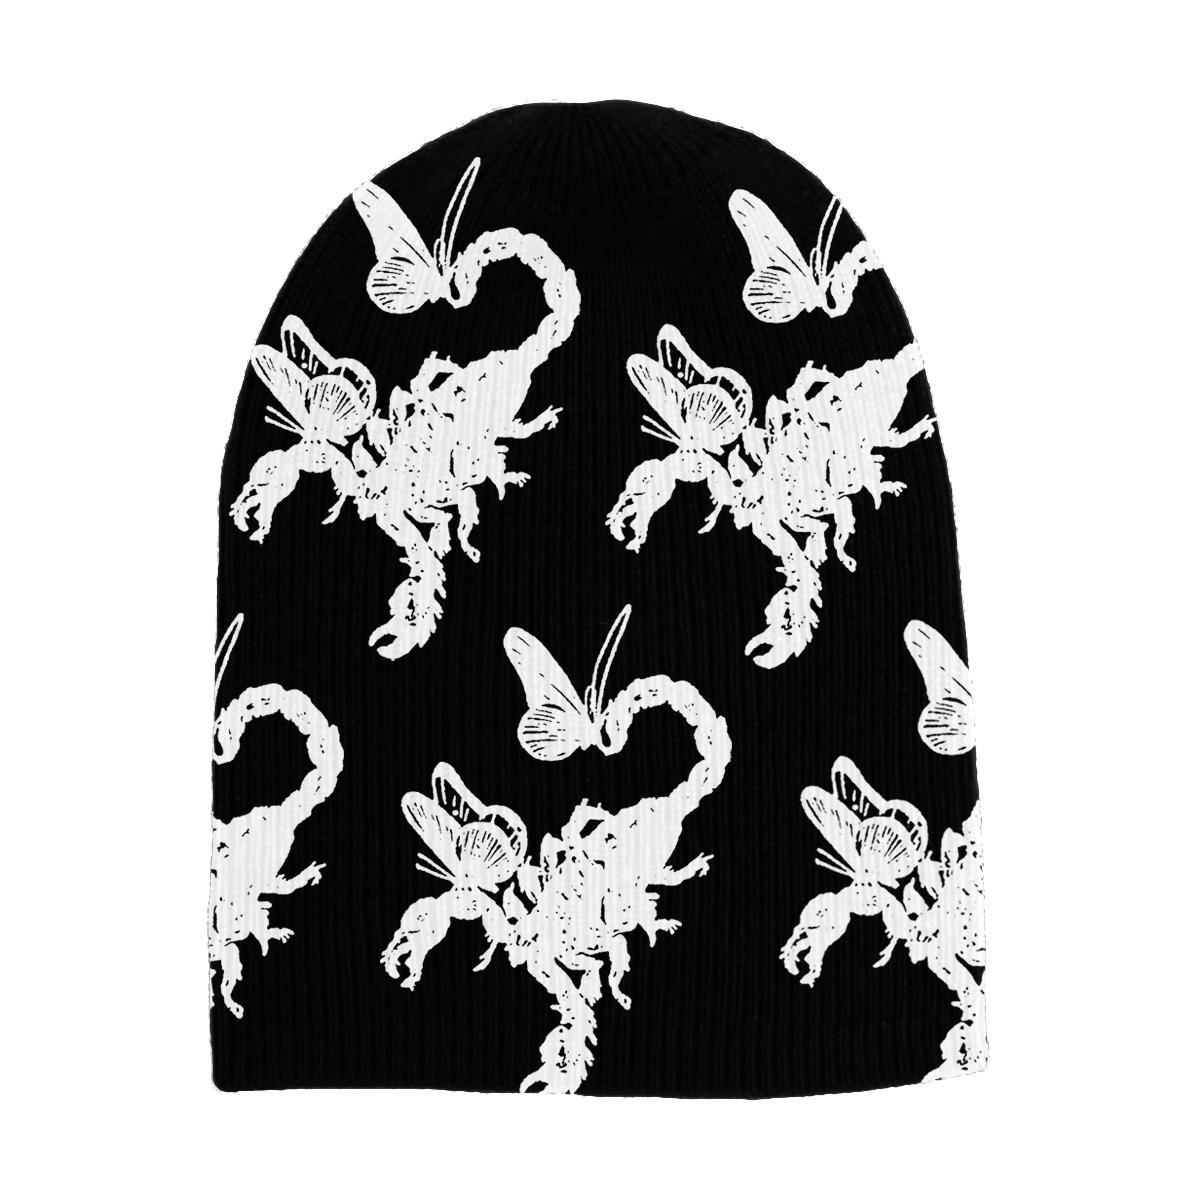 Smiley Flannel + Scorpion Beanie Bundle